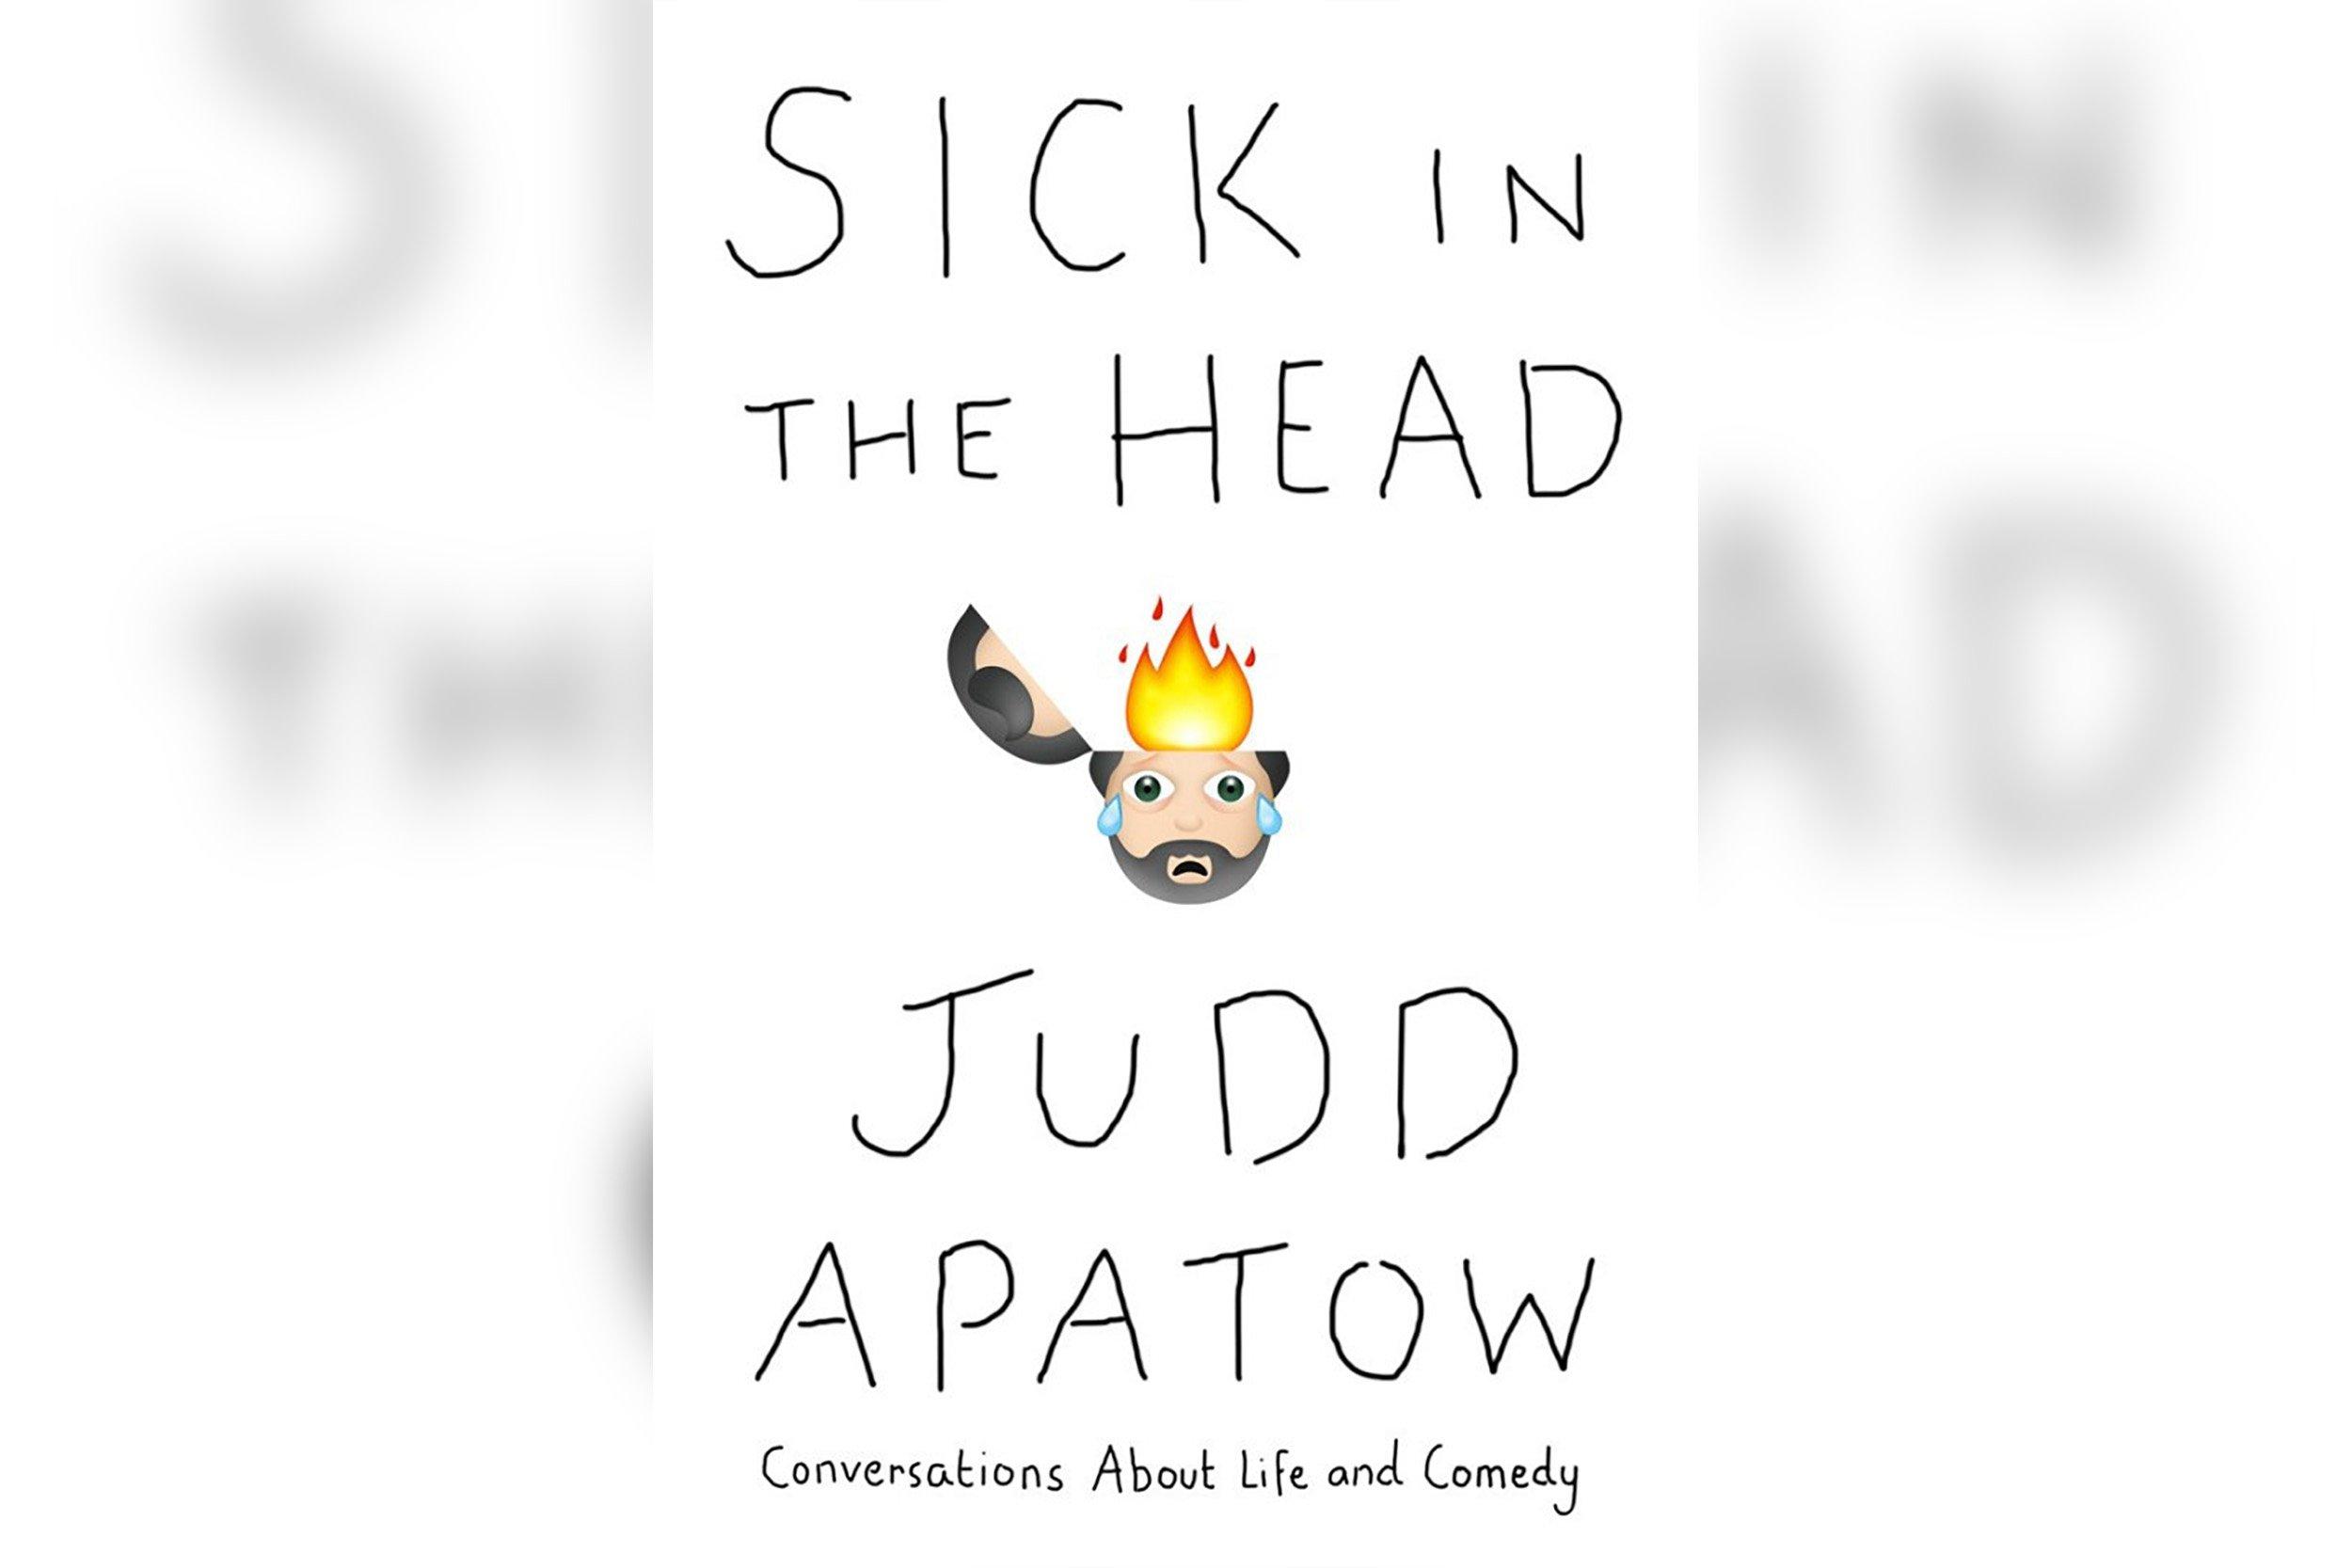 judd-apatow-640x960 (1)